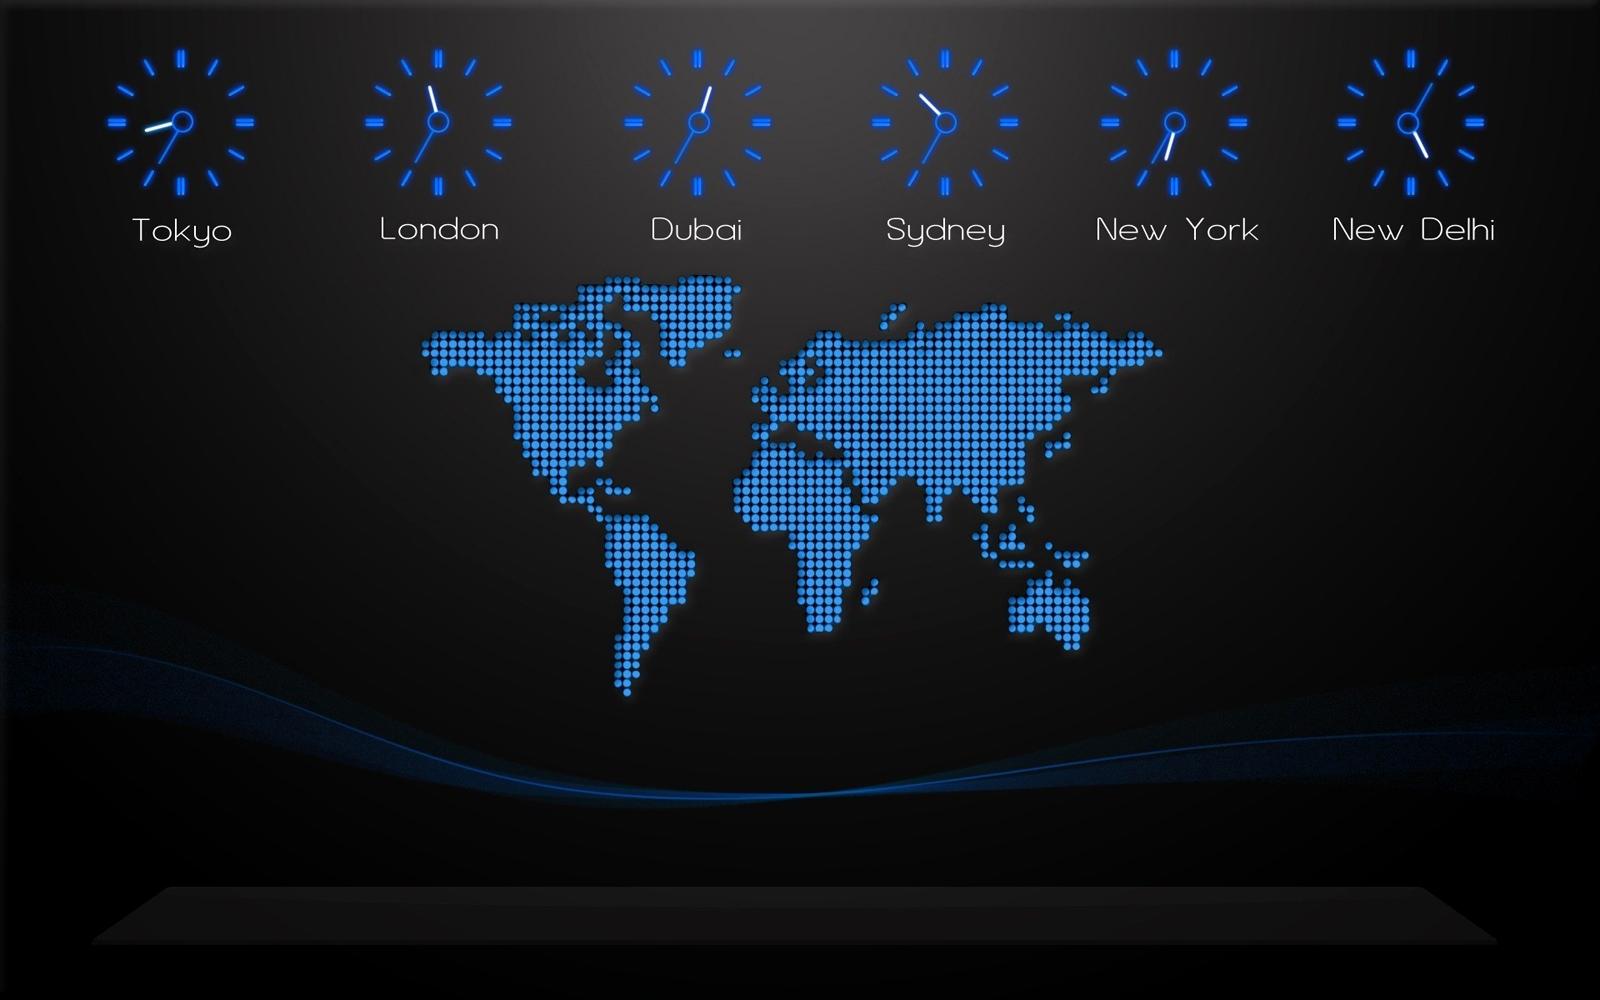 Map on Your Desktop Creative Designs Desktop Wallpaper HD Wallpapers 1600x1000